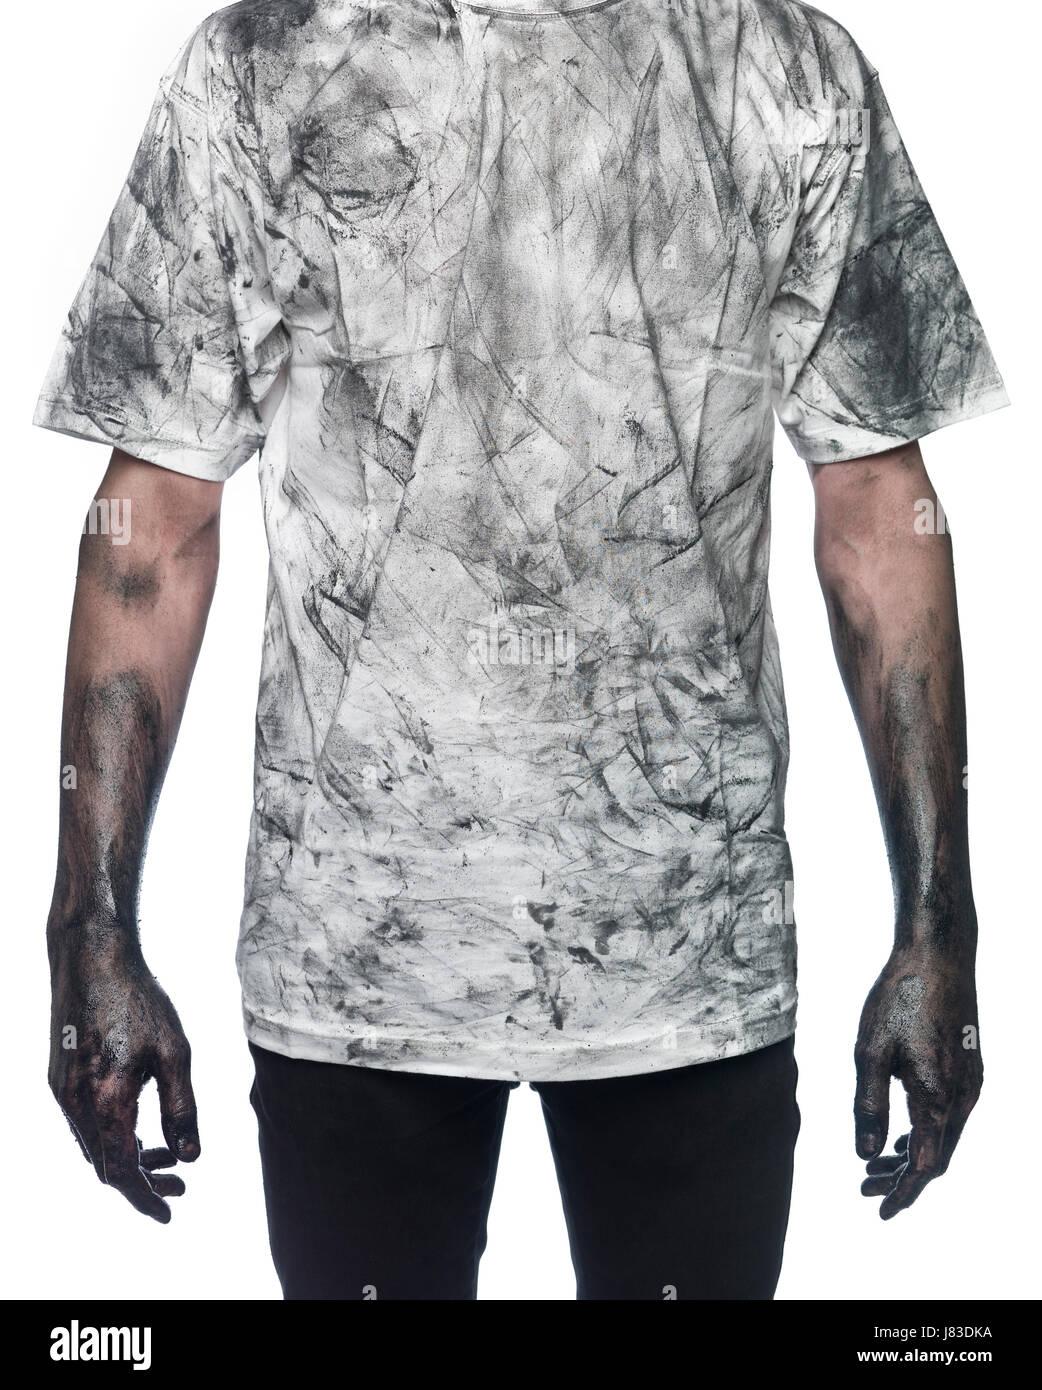 Oil Black Filthy Stockfotos & Oil Black Filthy Bilder - Alamy